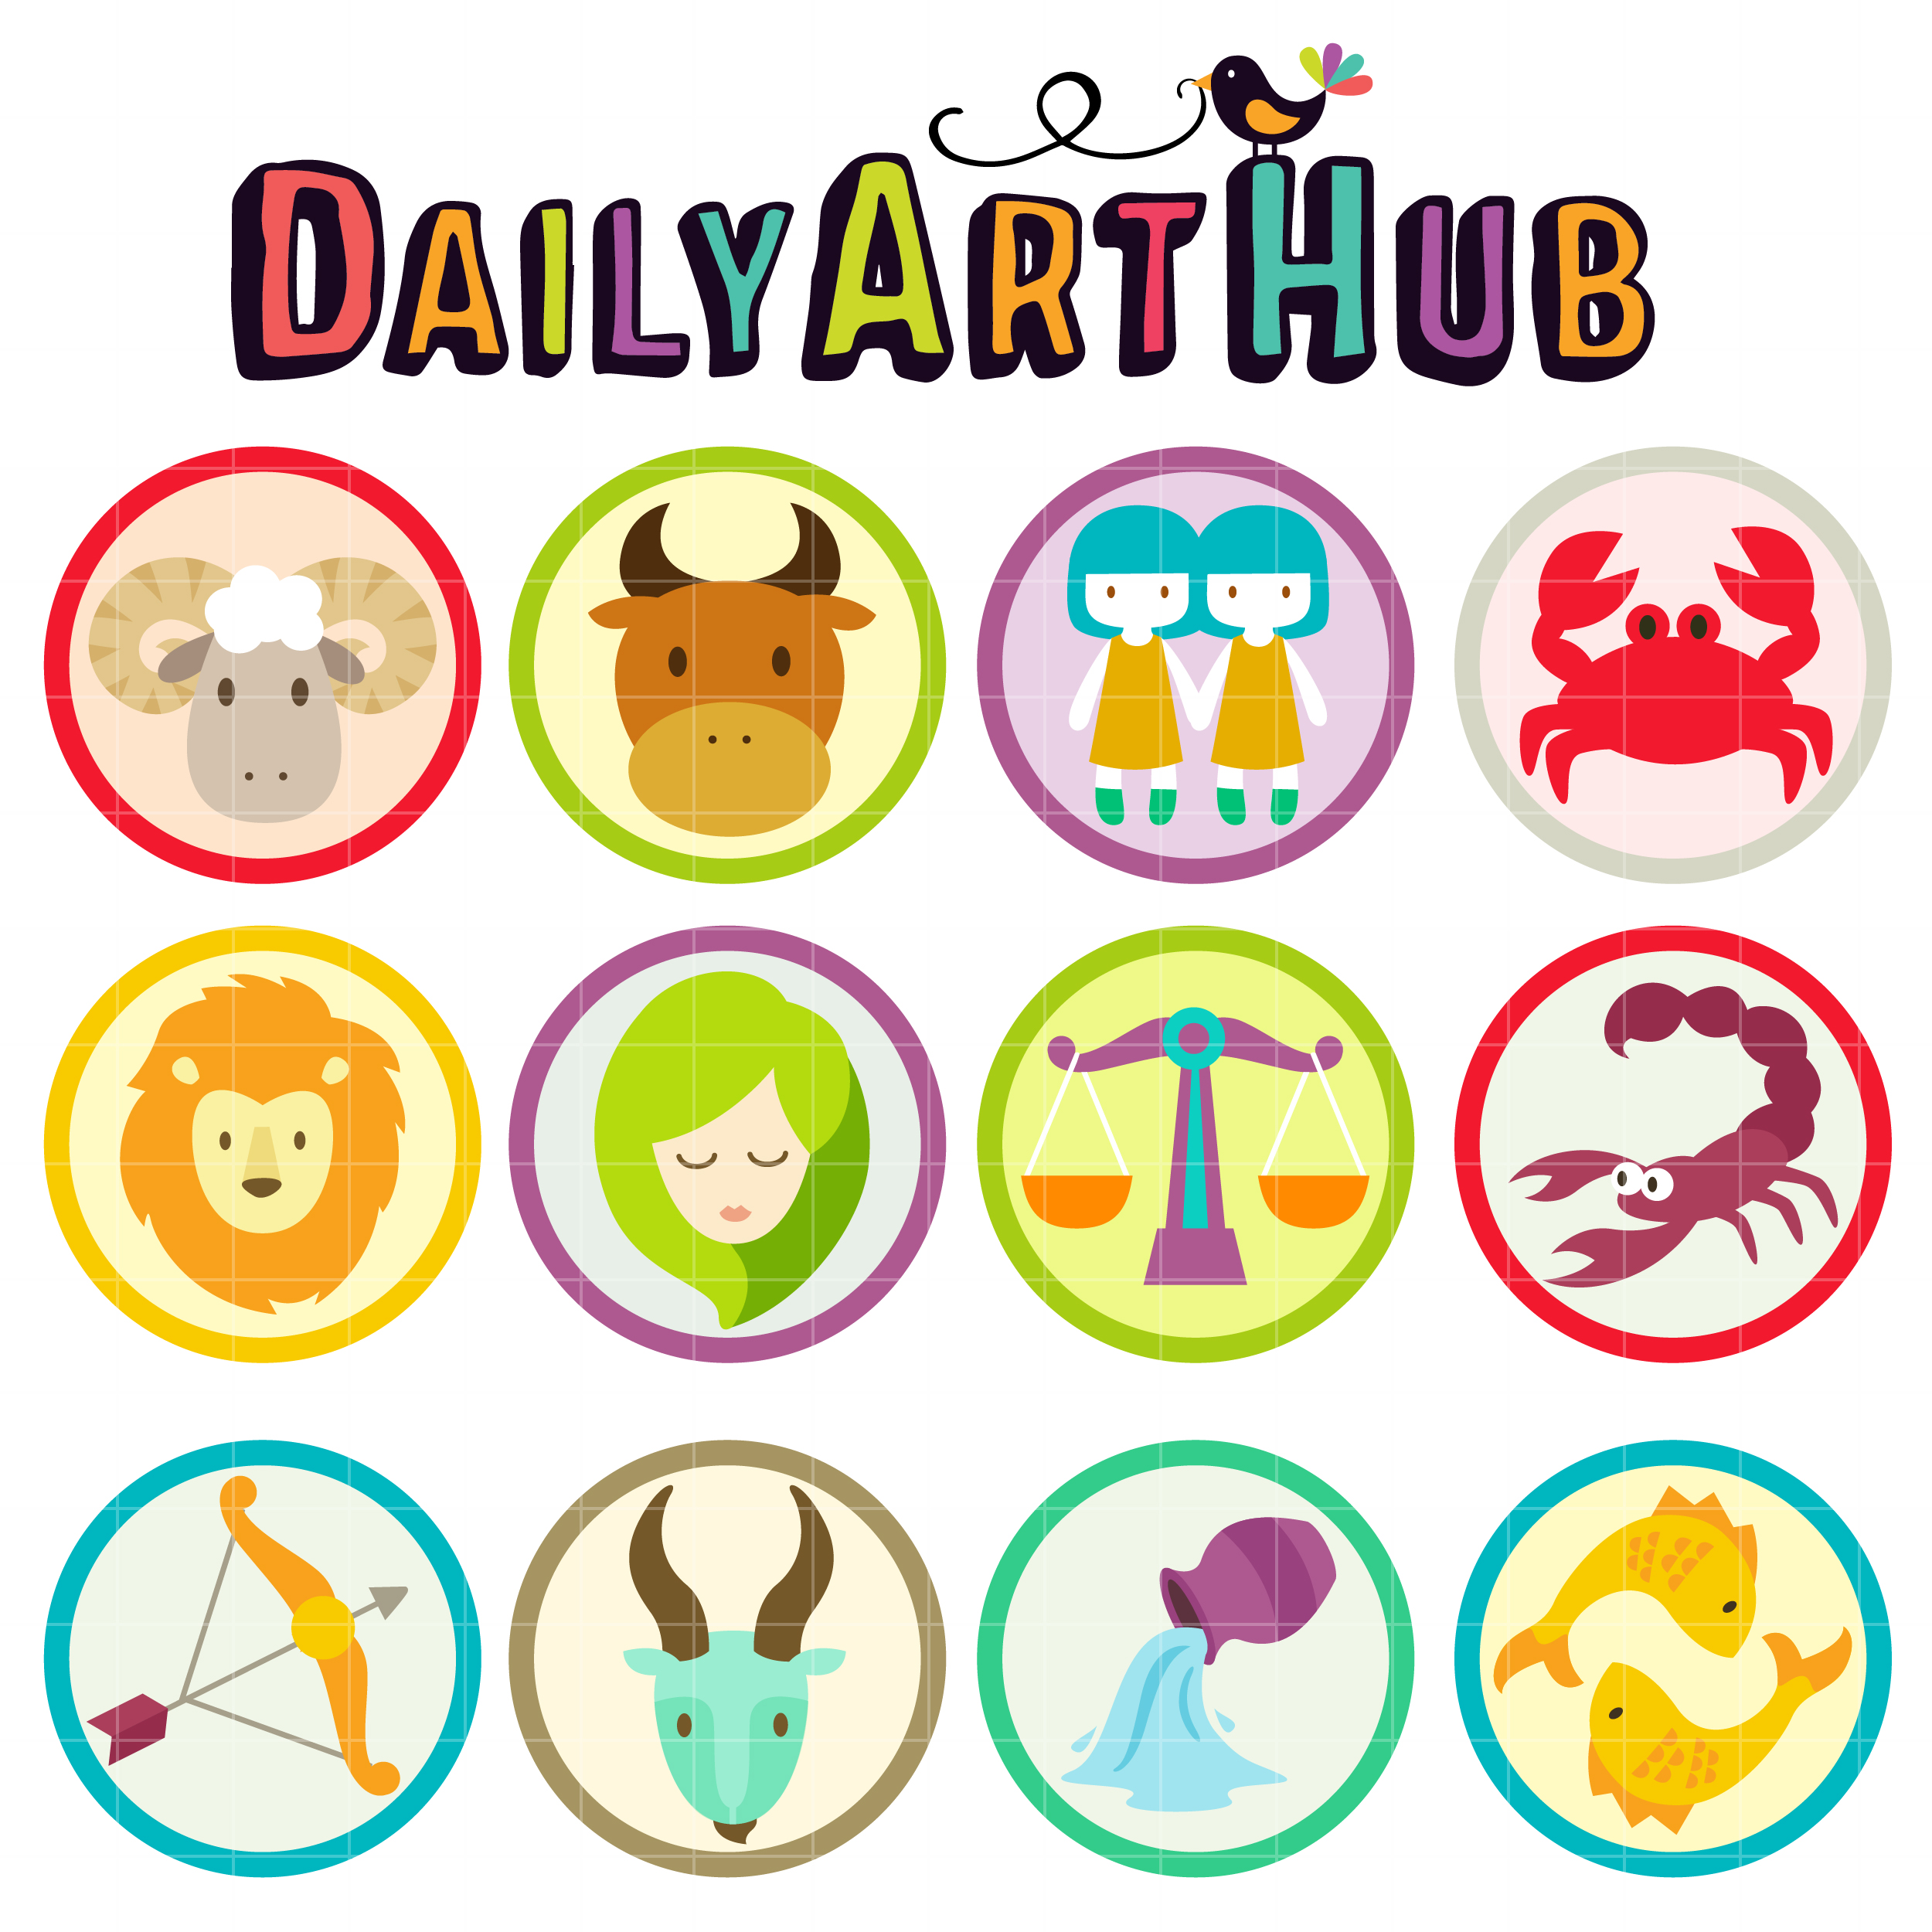 Cute Zodiac Signs Clip Art Set – Daily Art Hub – Free Clip Art Everyday